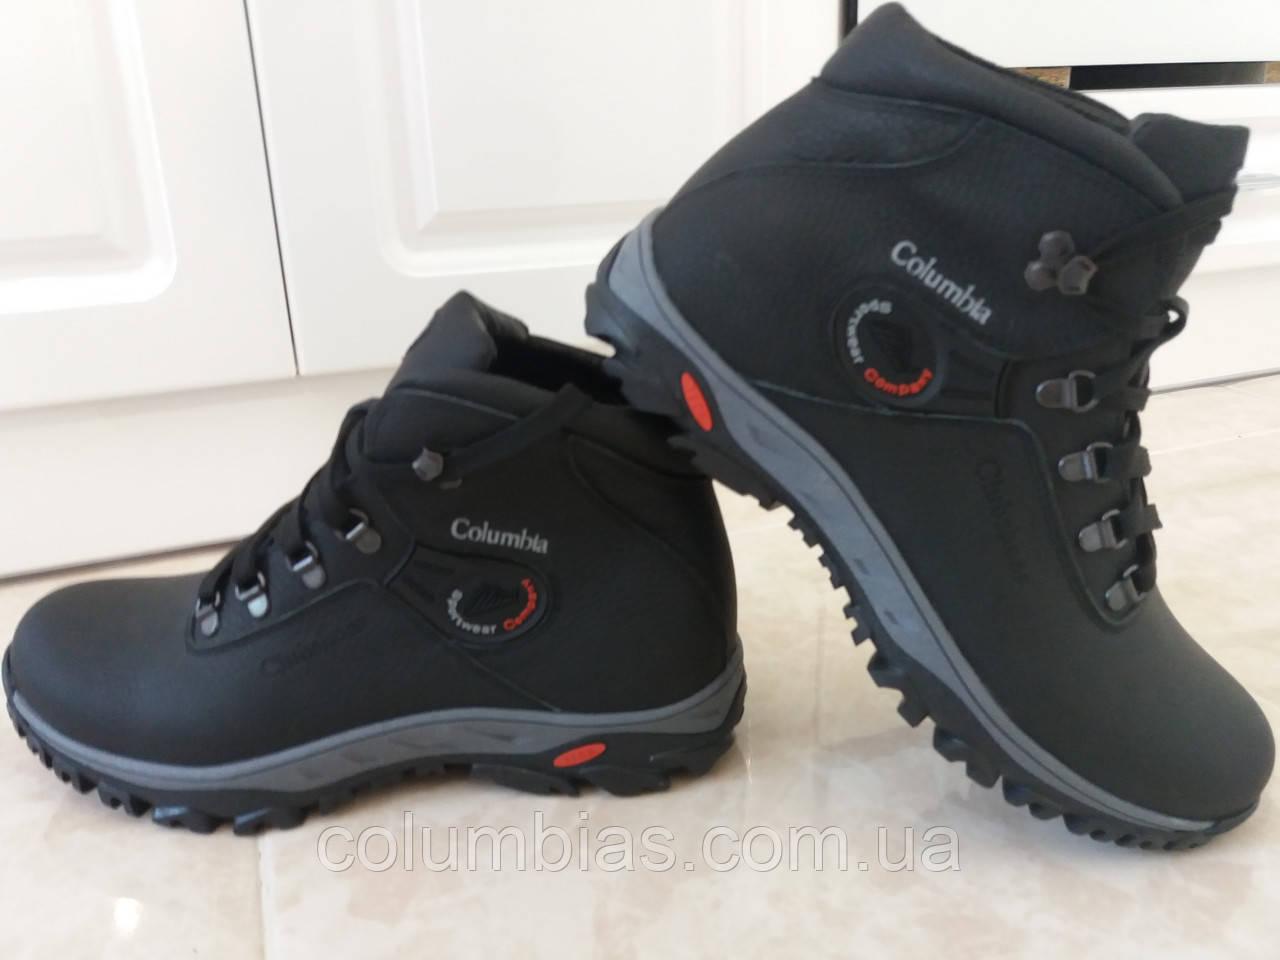 Зимние ботинки Collumbia недорого